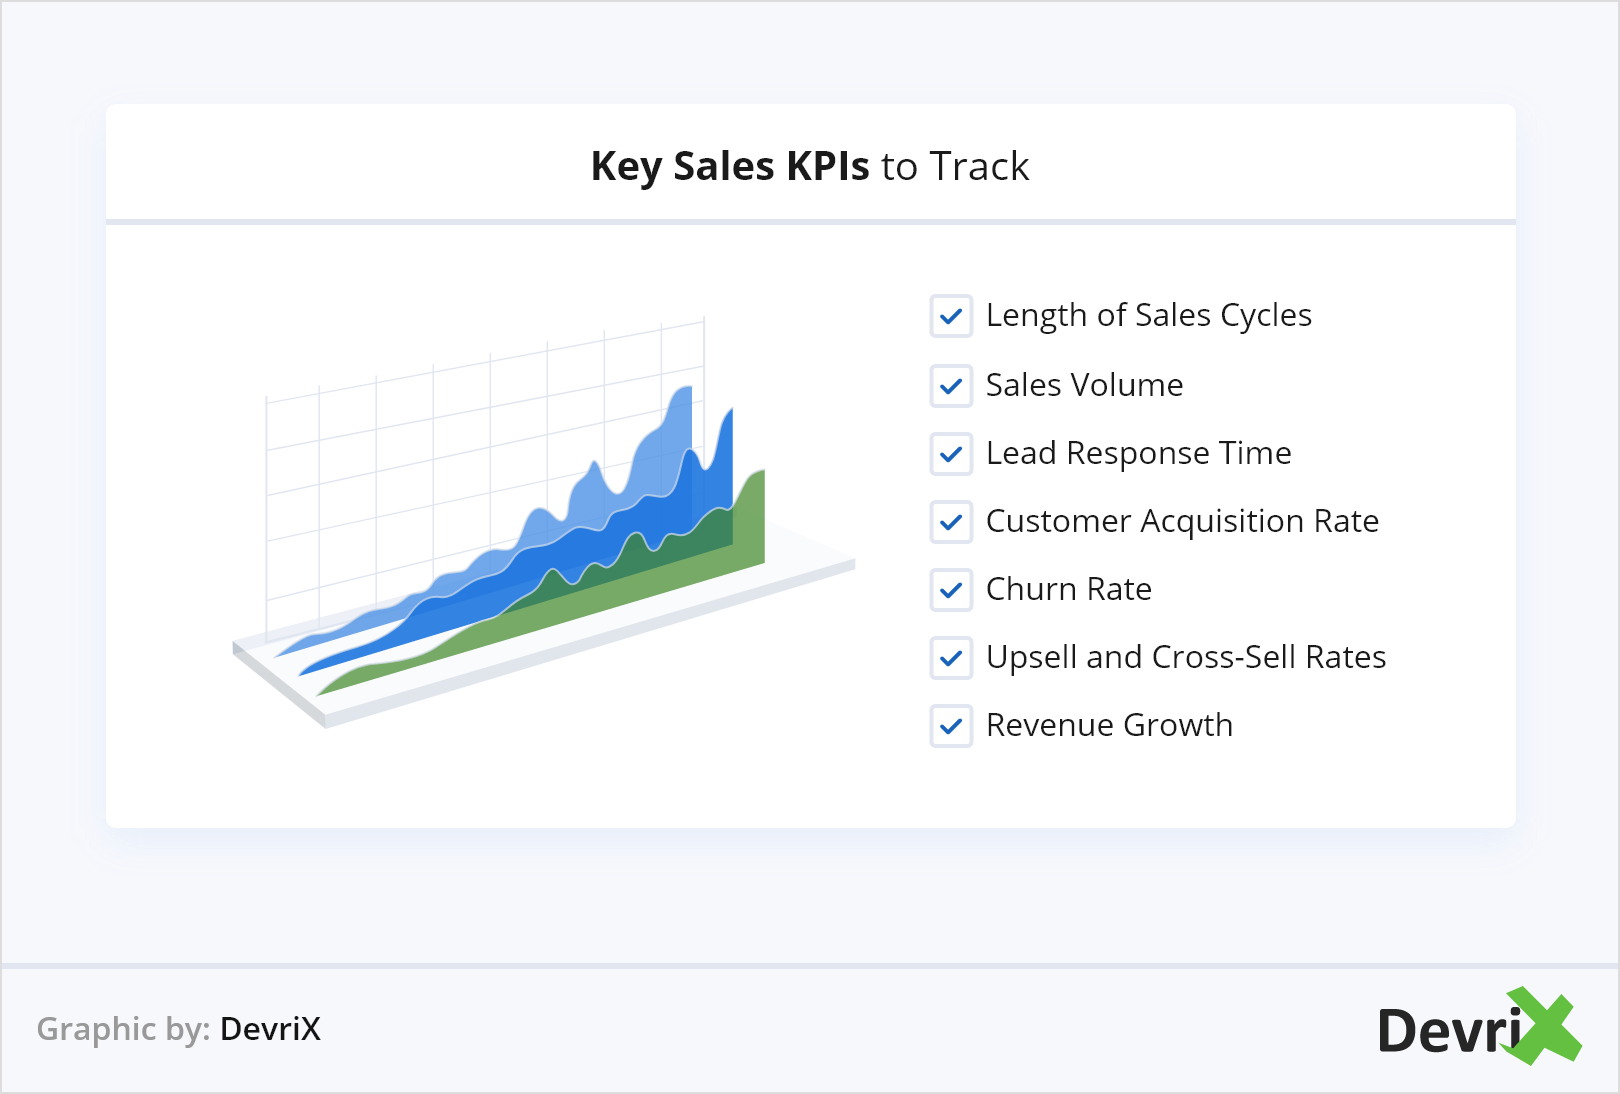 Key Sales KPIs to Track